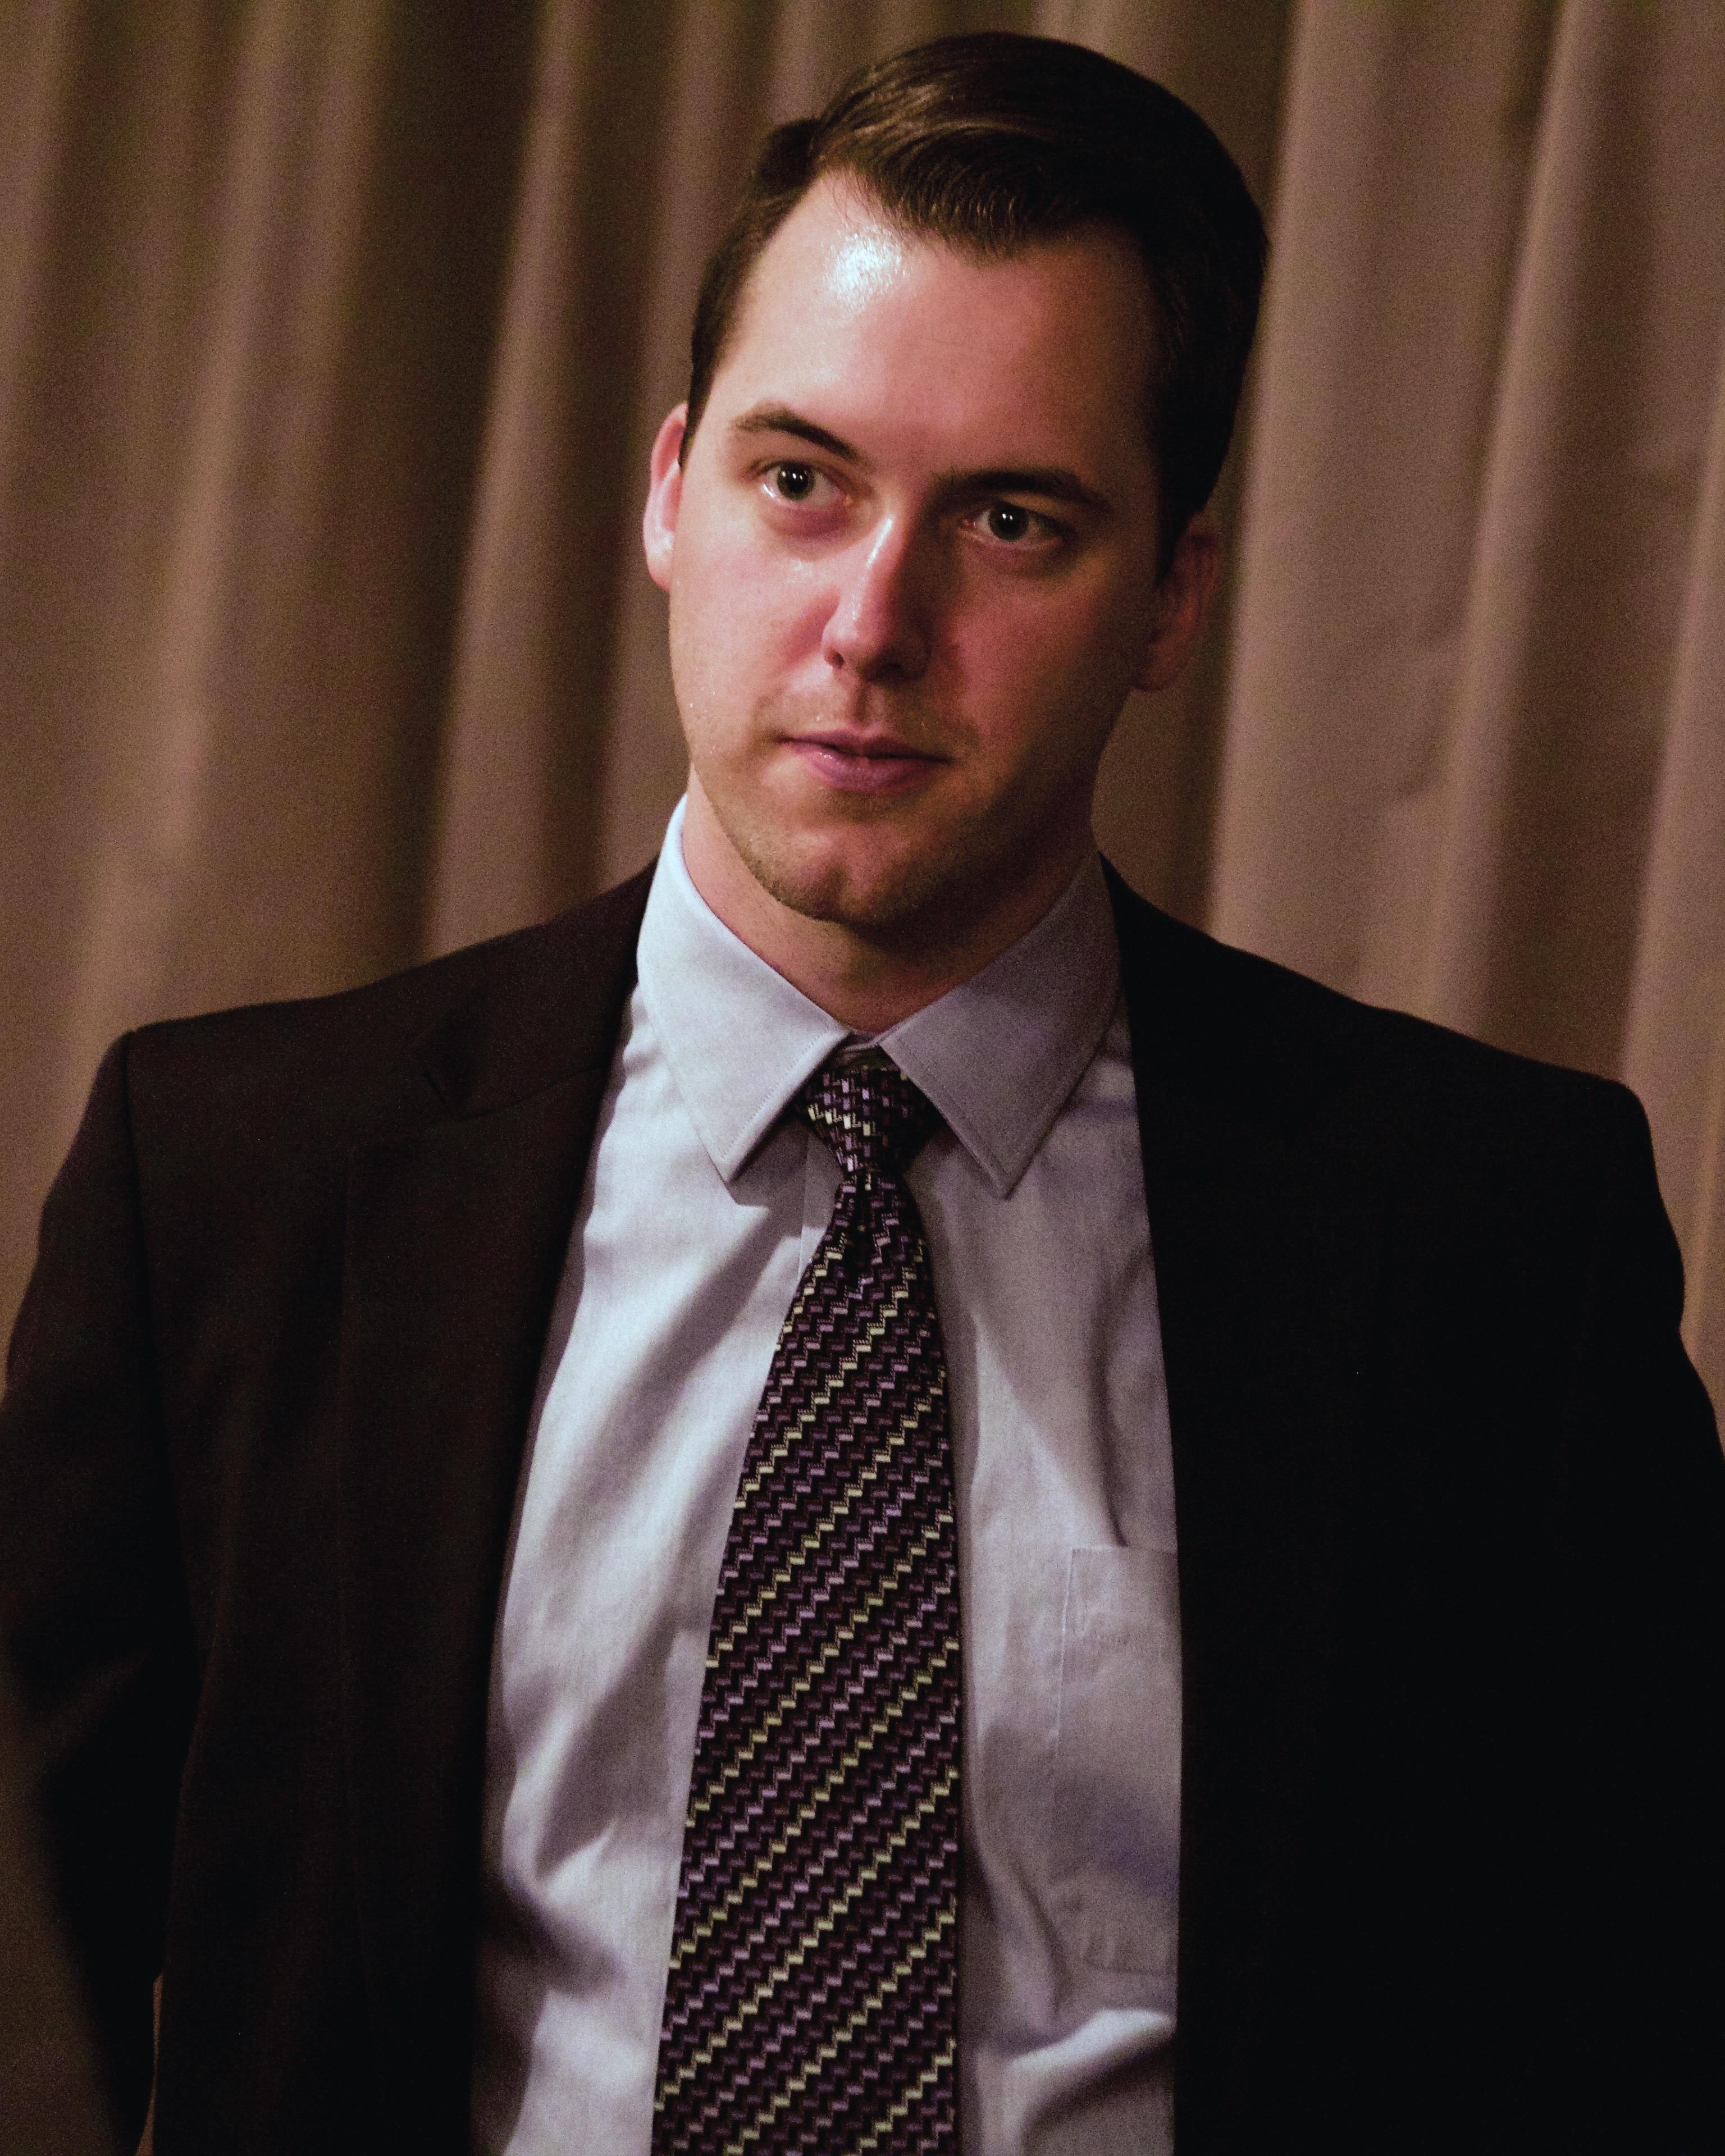 Image of Joshua Friedemena